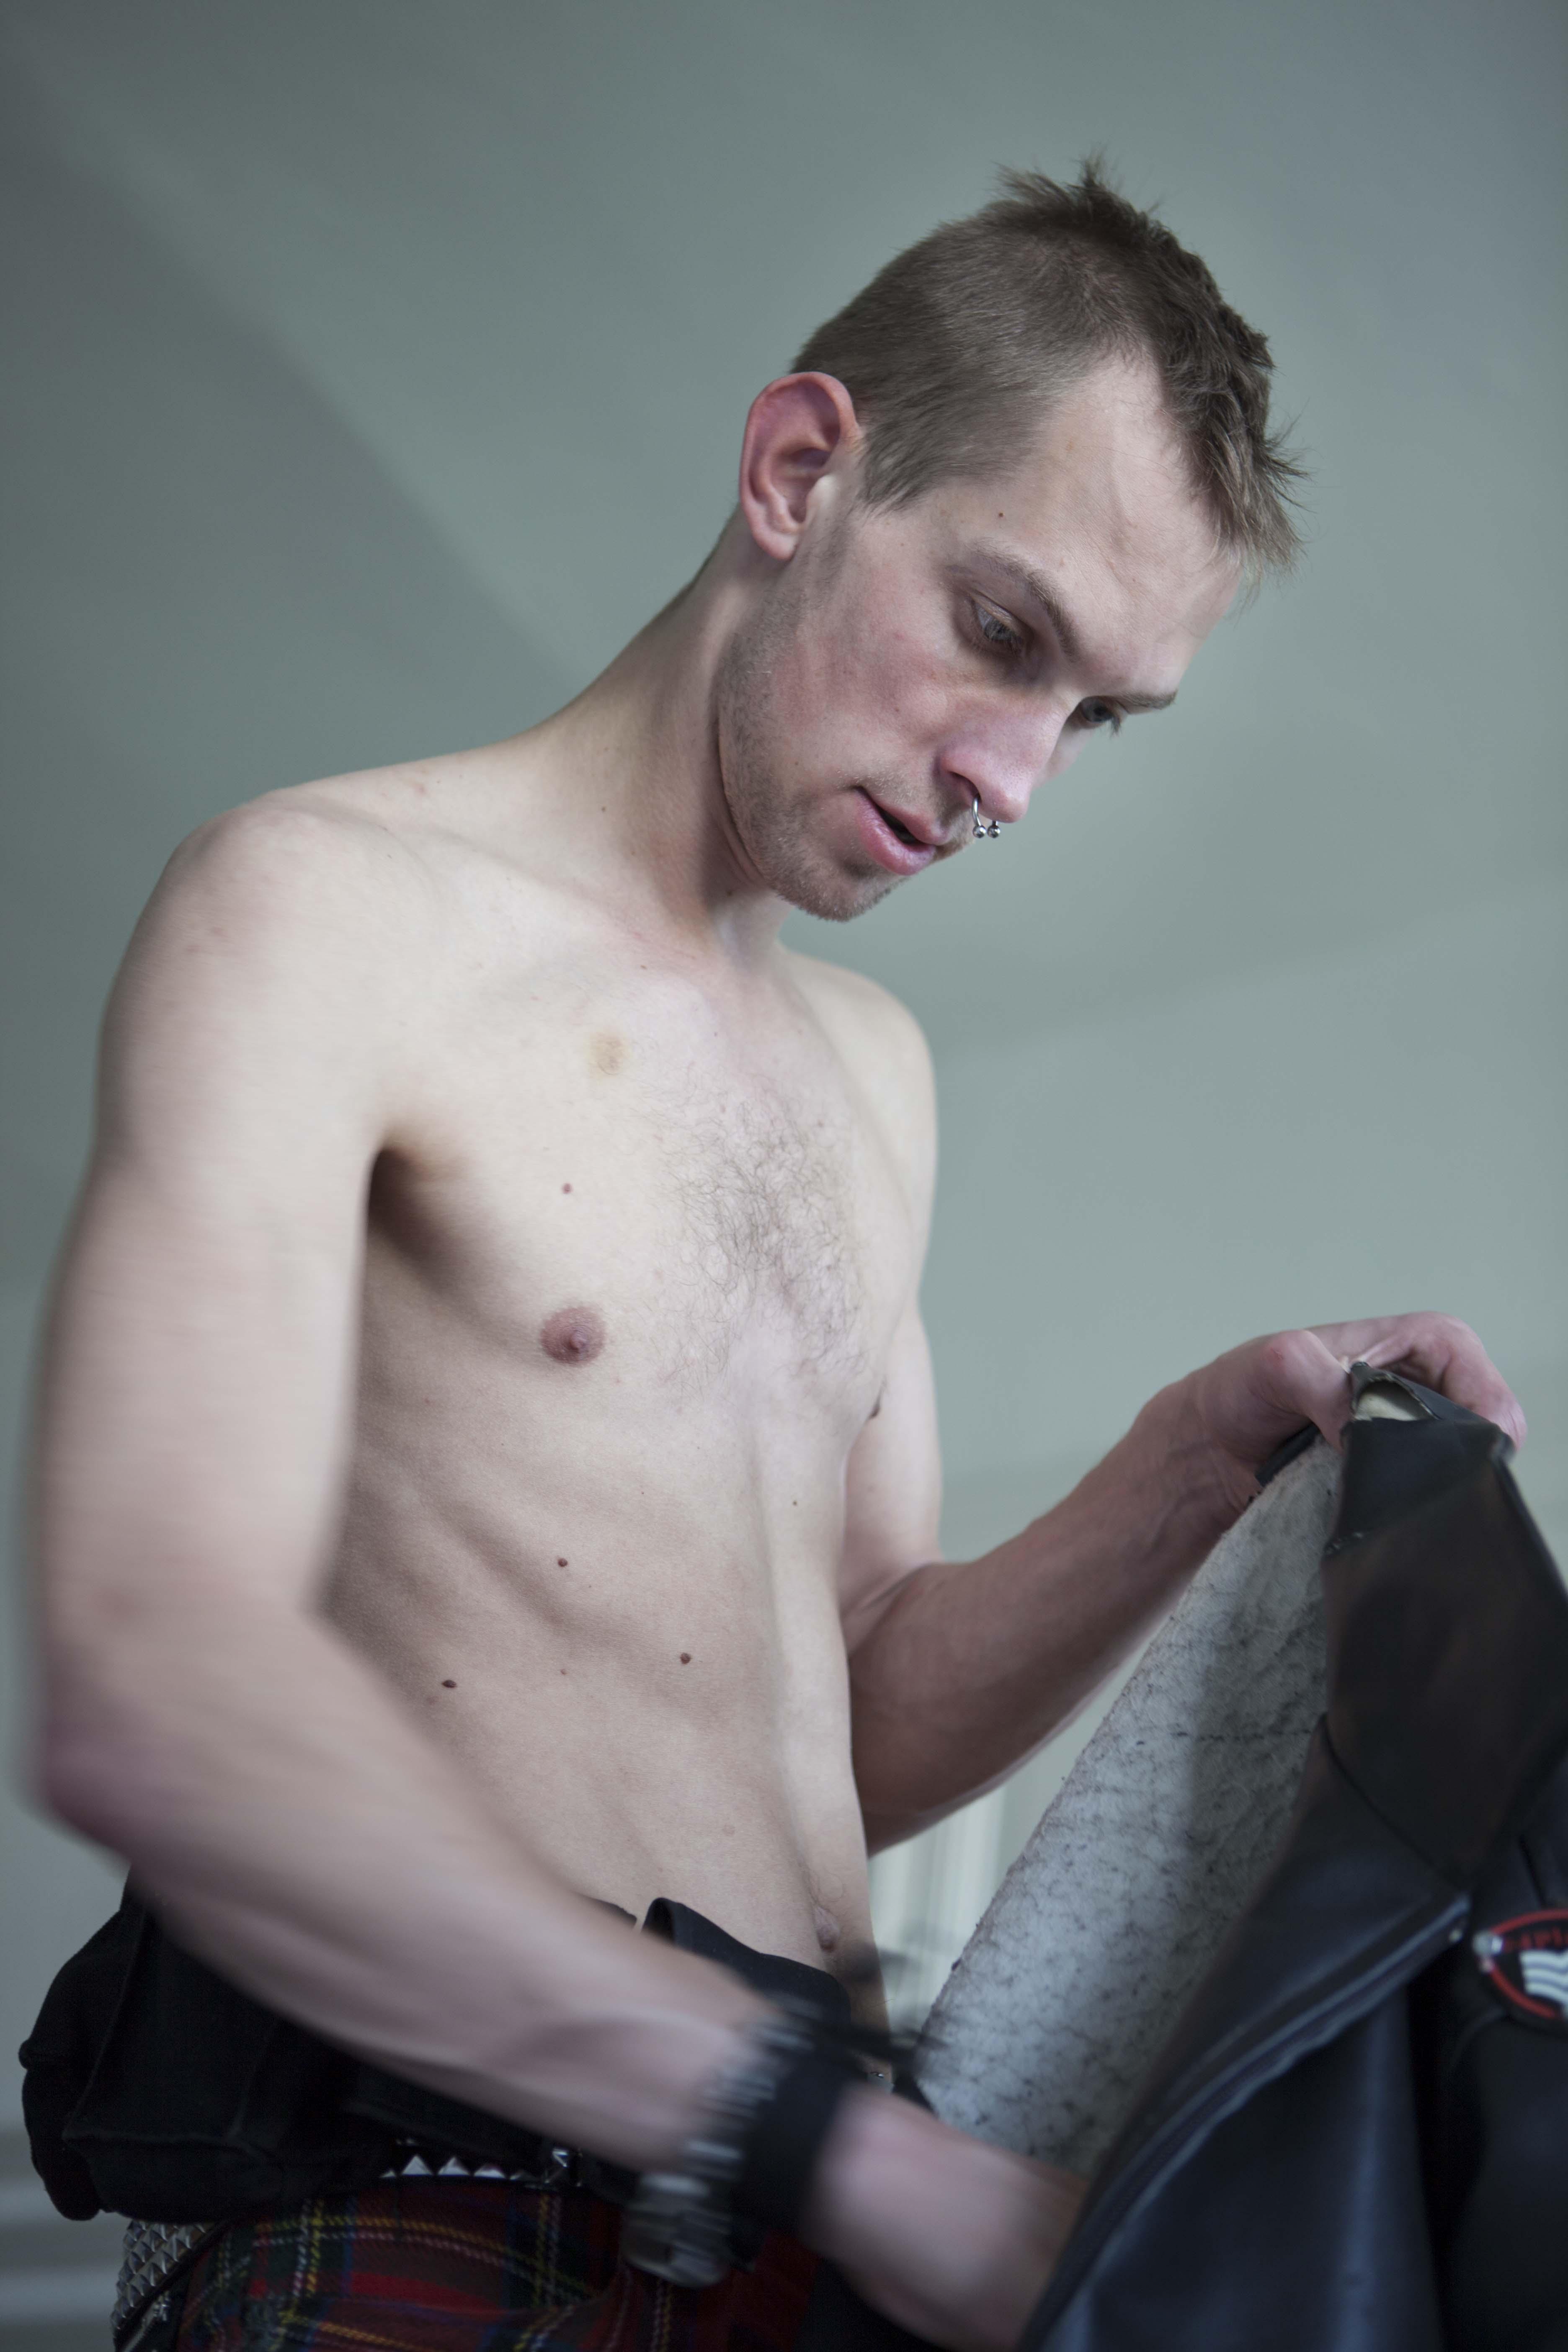 Christian_Vagt_Punk_Skin-8_Geert_getting_up_Berlin_2009